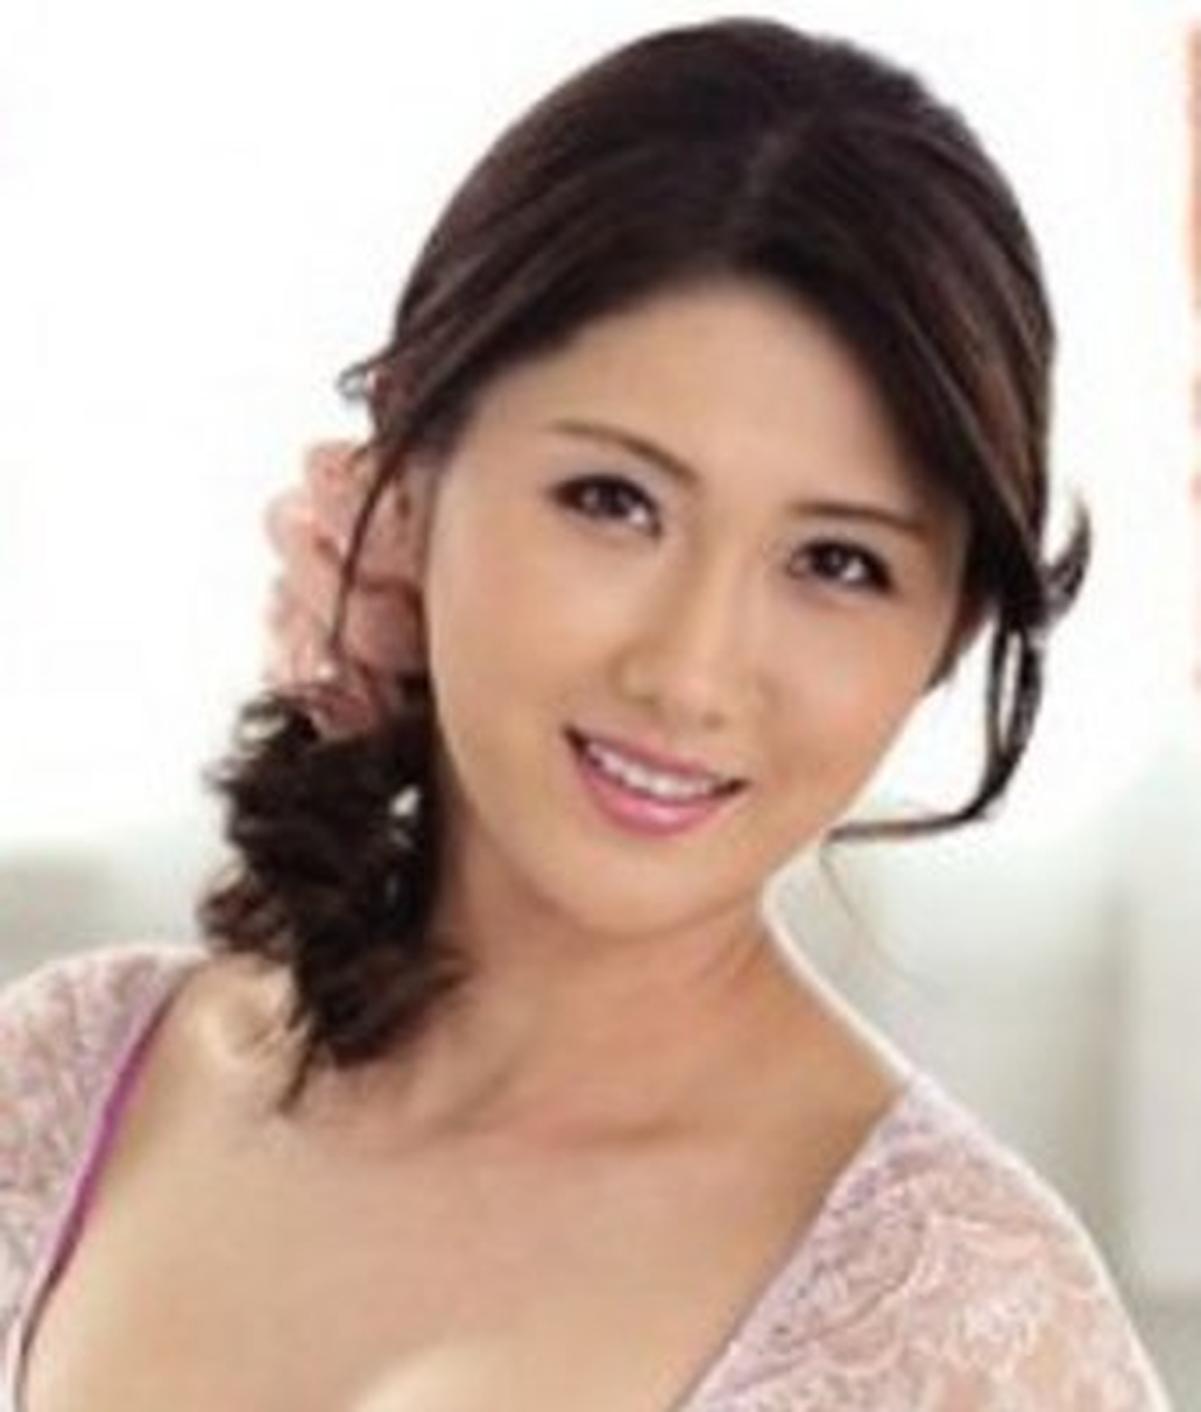 Chitose Hara wiki, Chitose Hara bio, Chitose Hara news